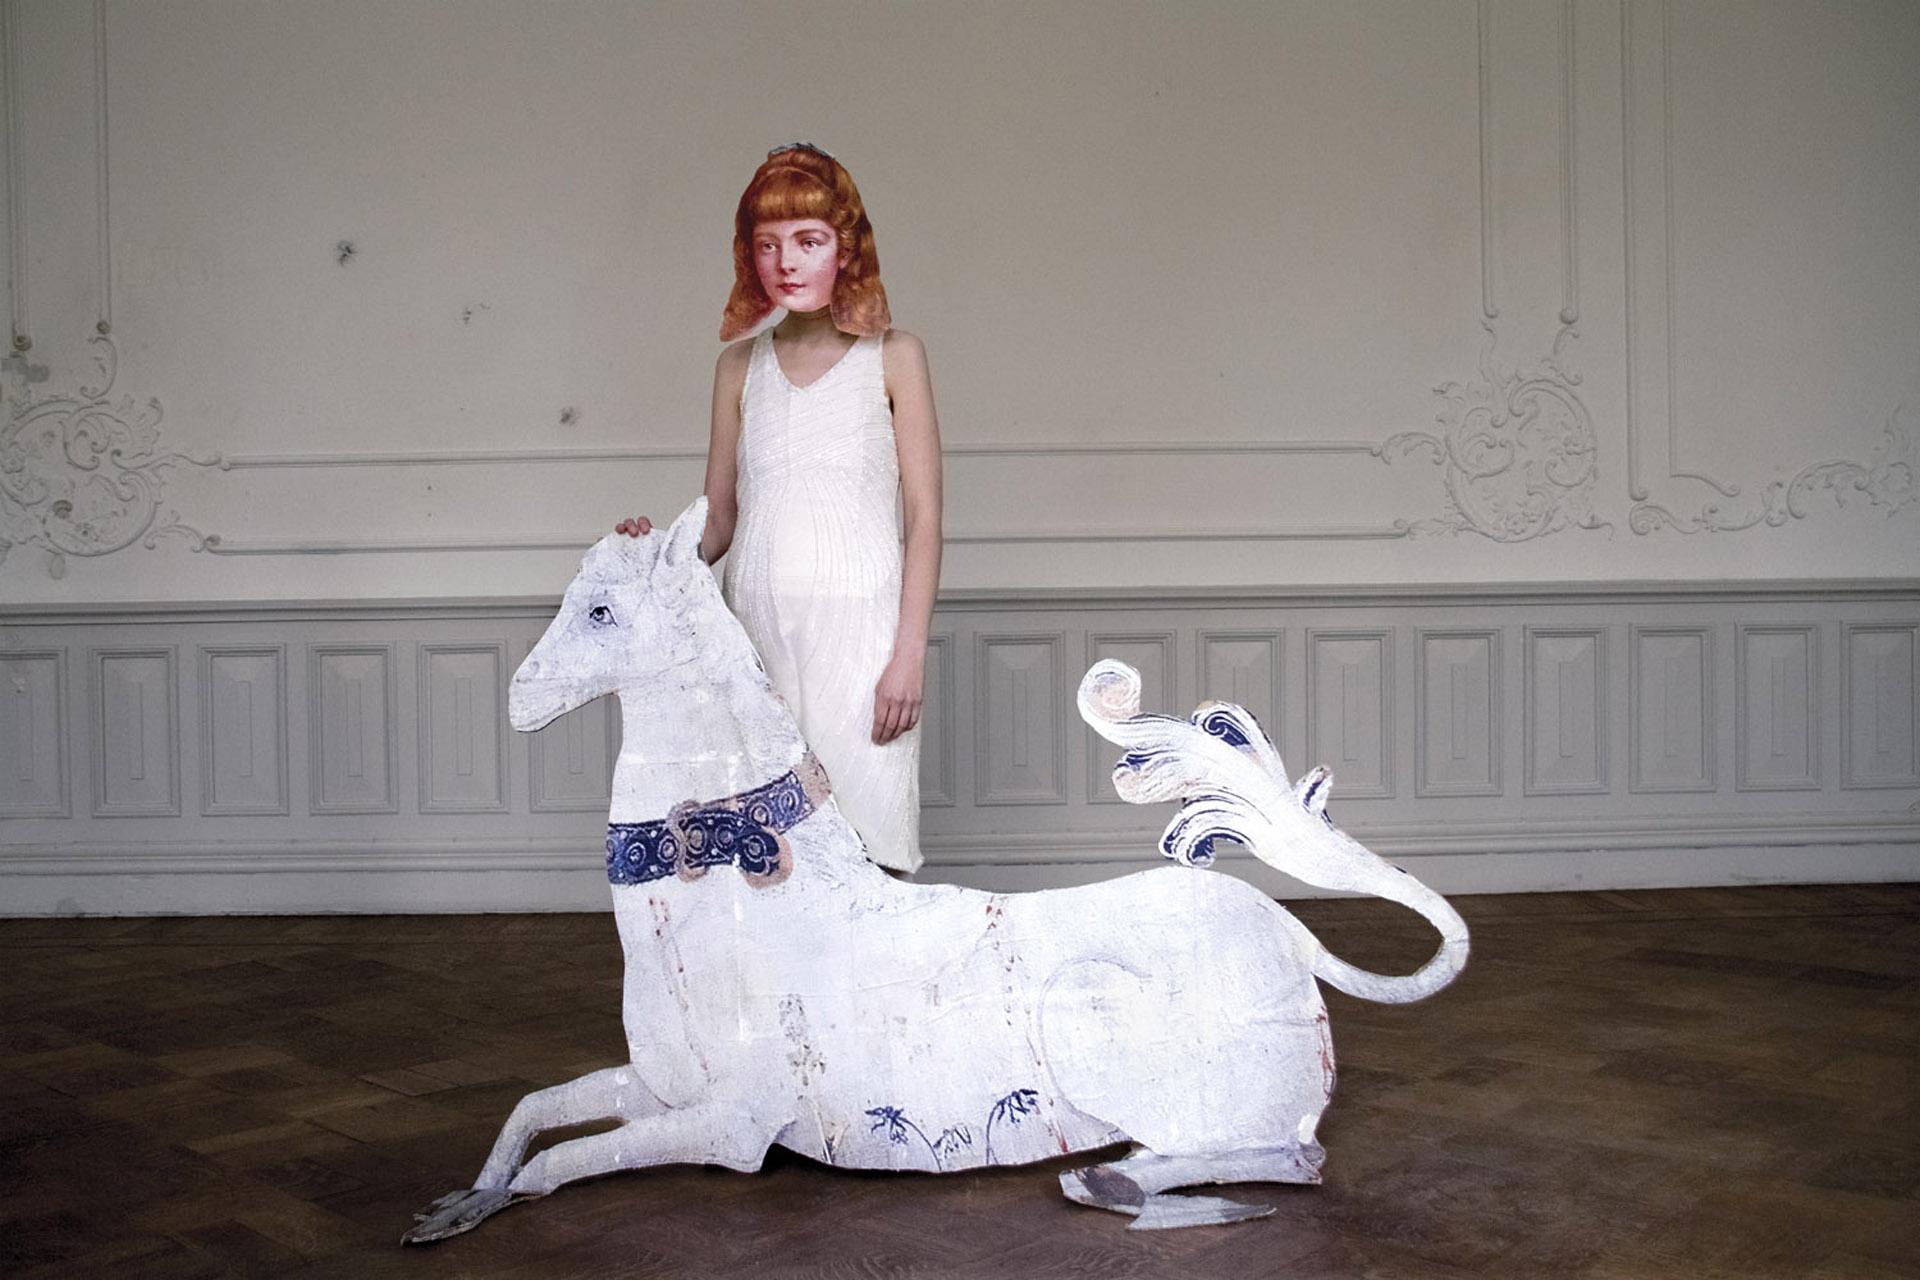 Series: Milavida, Girl and the White Horse, 2012. 75cm x 50cm + 2 AP. E.D 2/5. 30cm x 45cm E.D. 2/5.